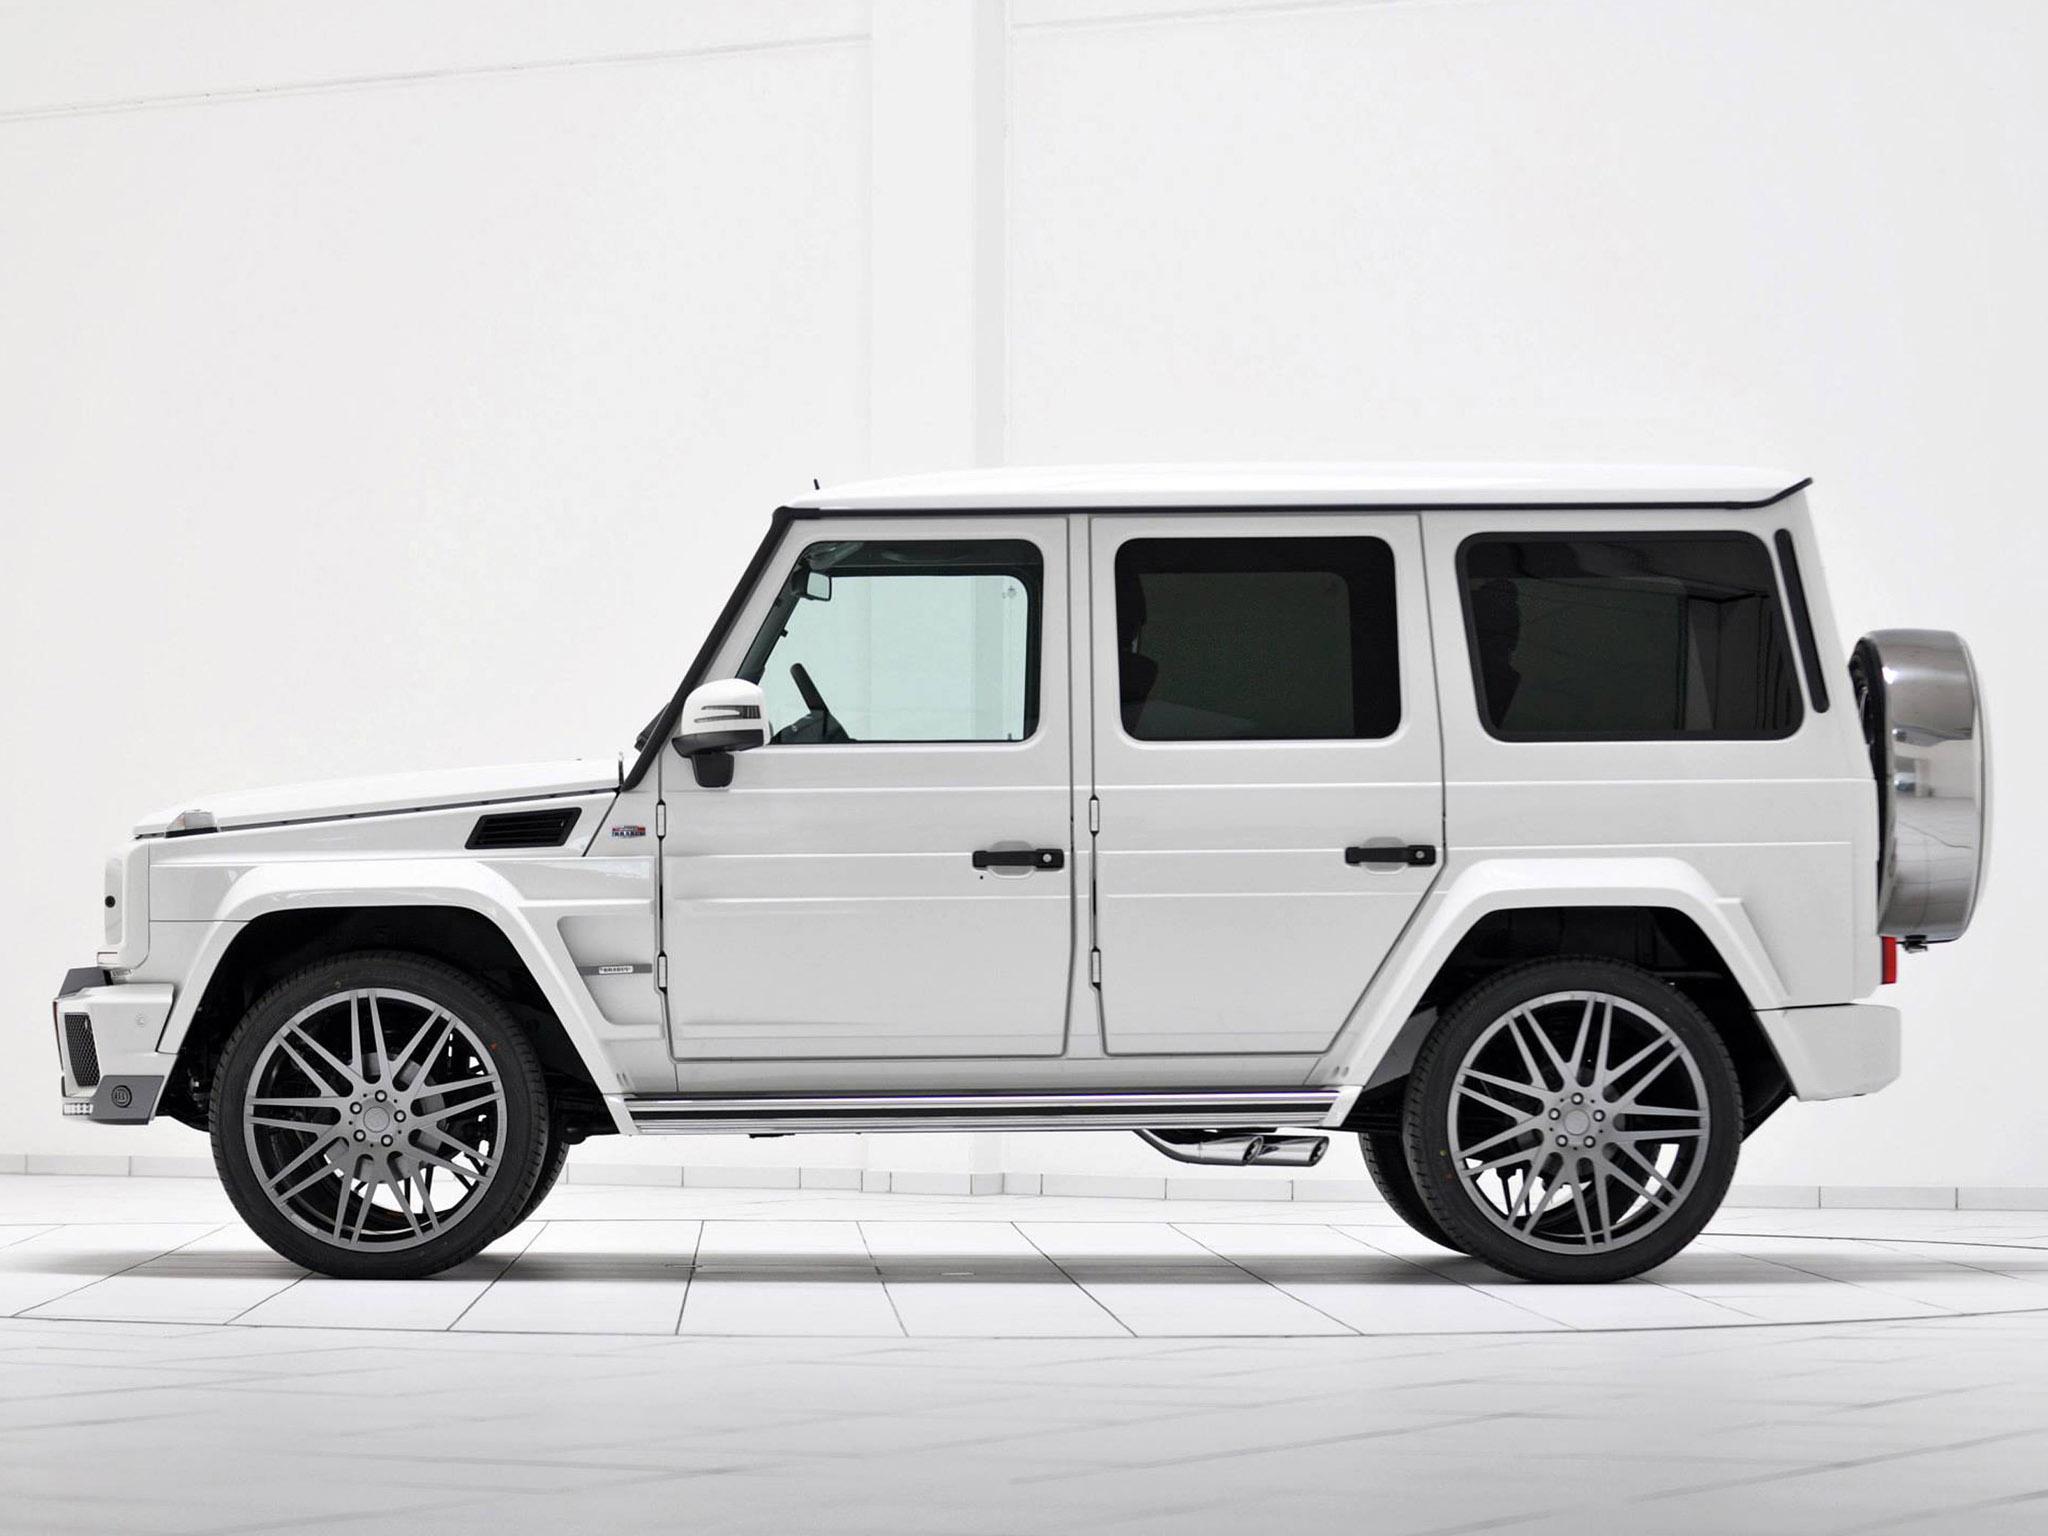 2013 brabus widestar mercedes benz g class 350 cdi suv tuning f wallpaper 2048x1536 123628 wallpaperup - White Mercedes Suv 2013